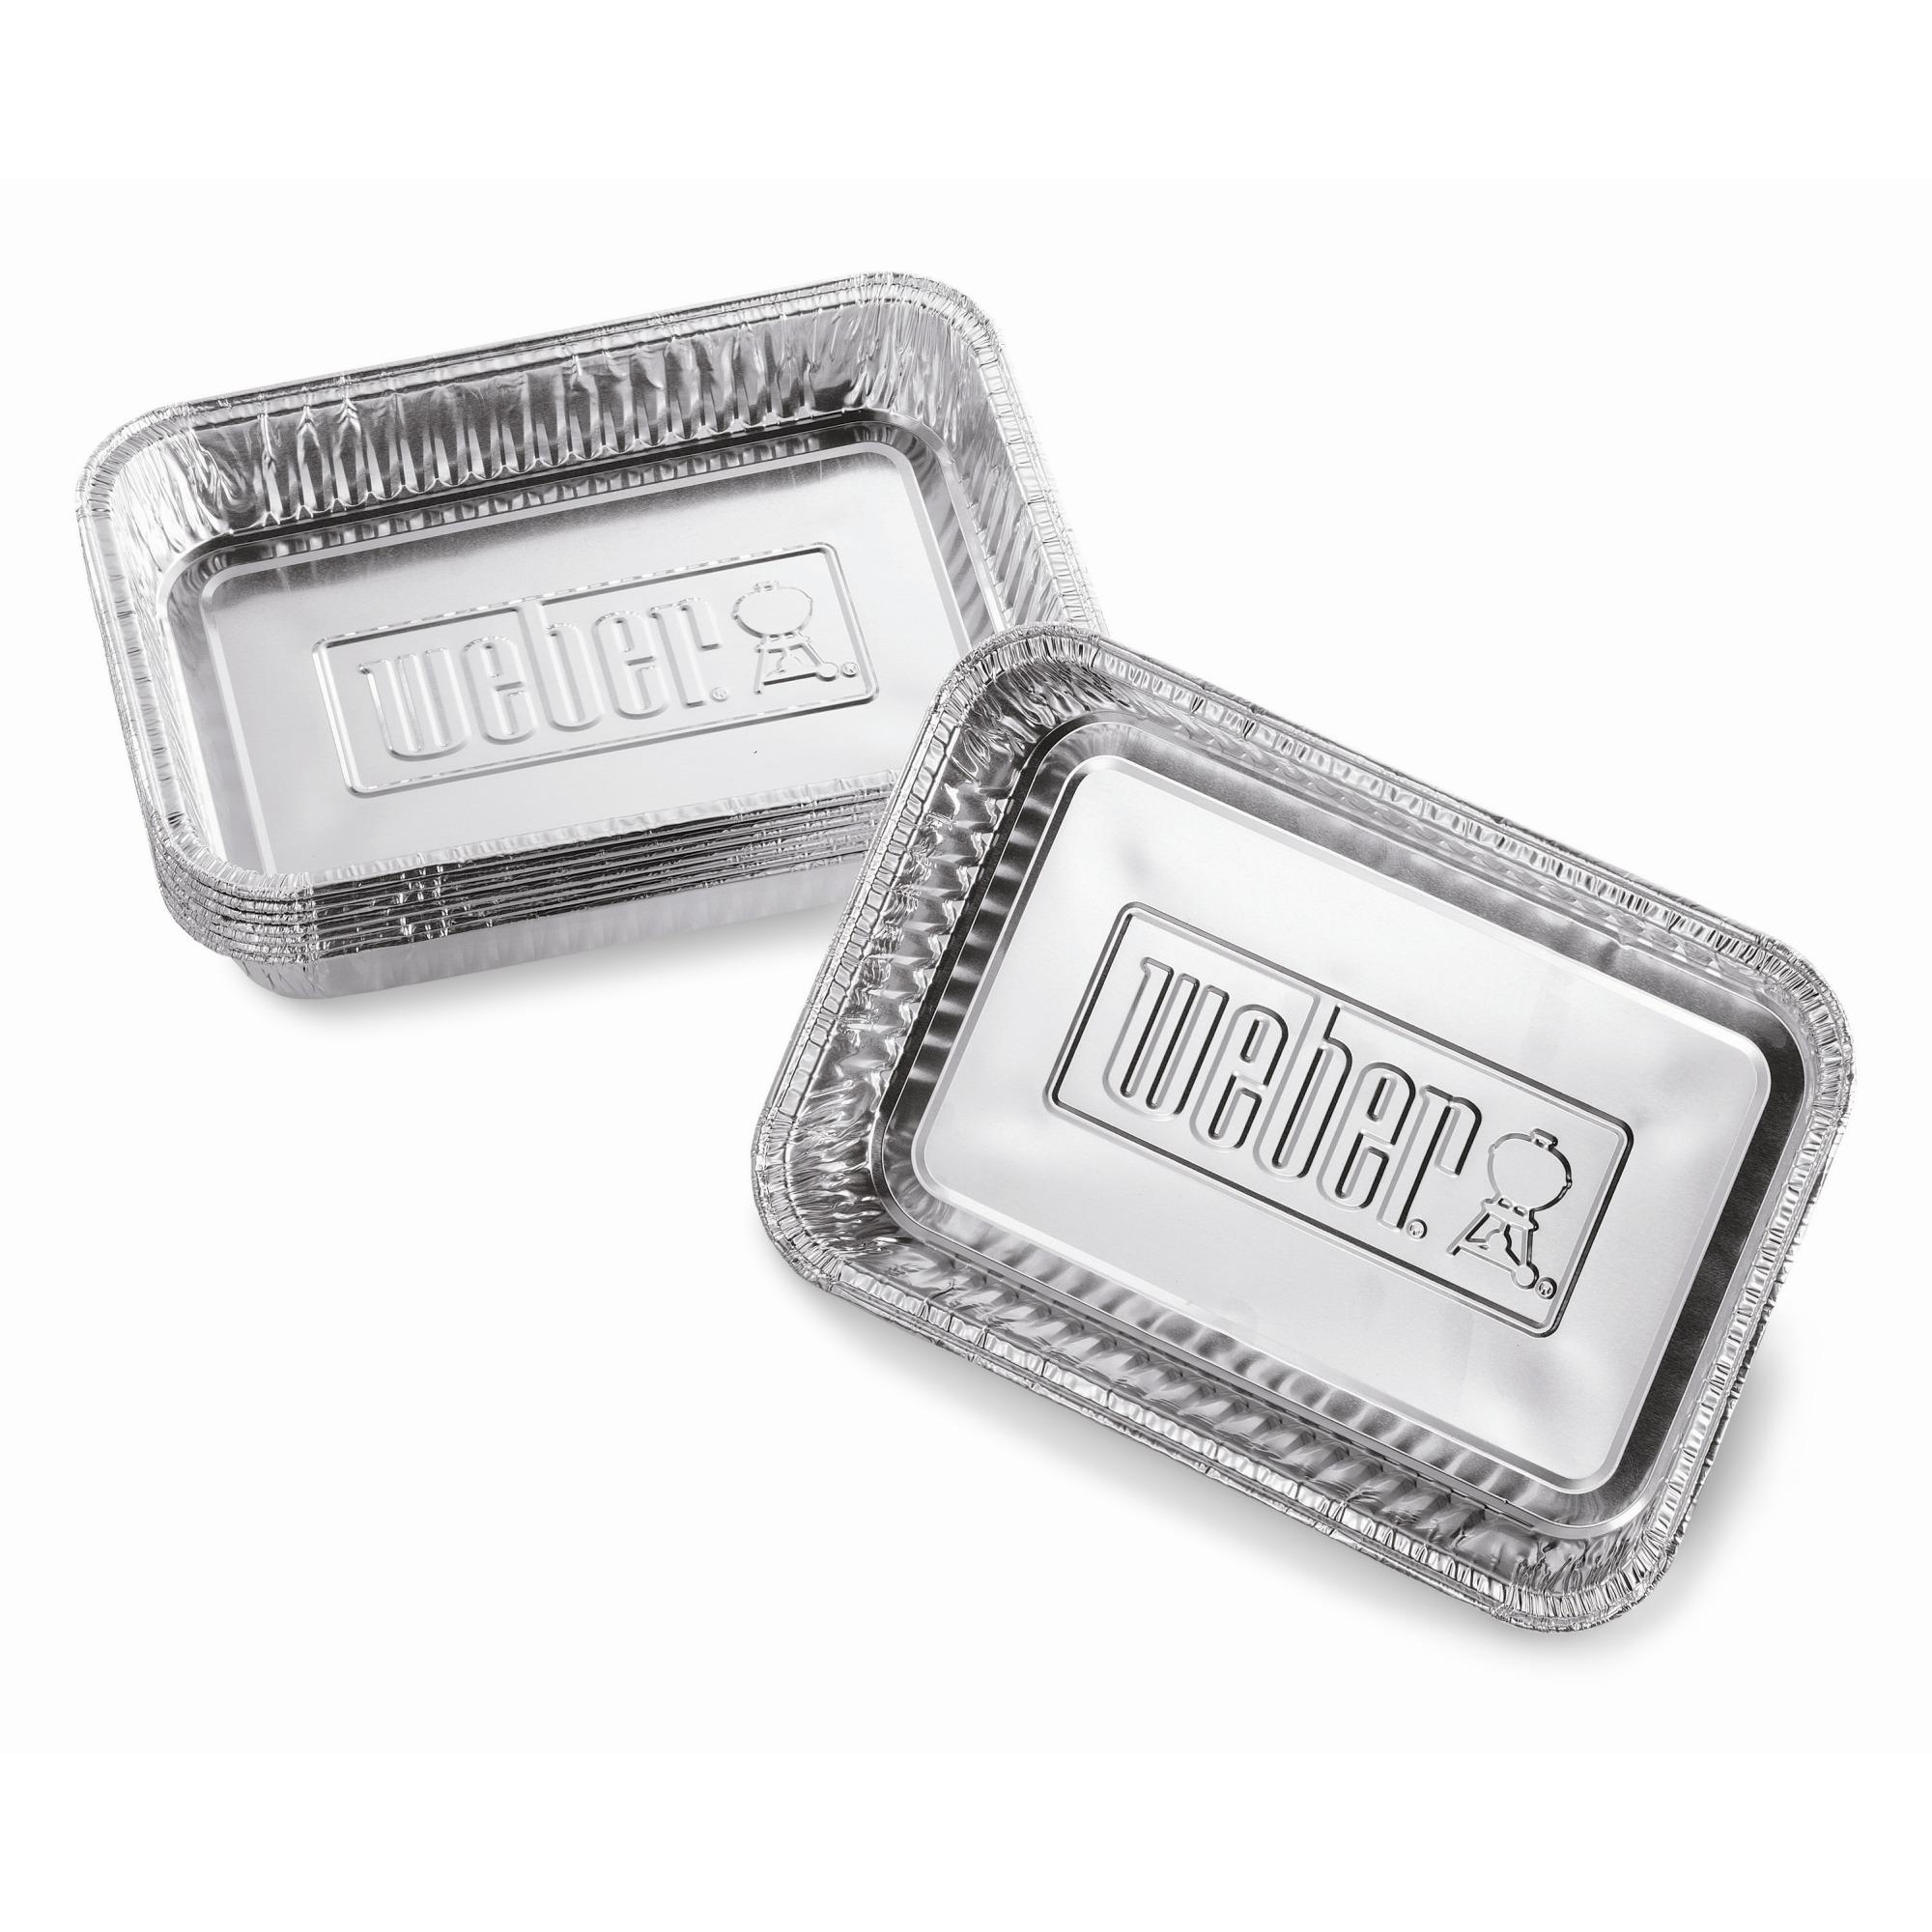 Weber Aluminium Lekbakjes 10 stuks Klein